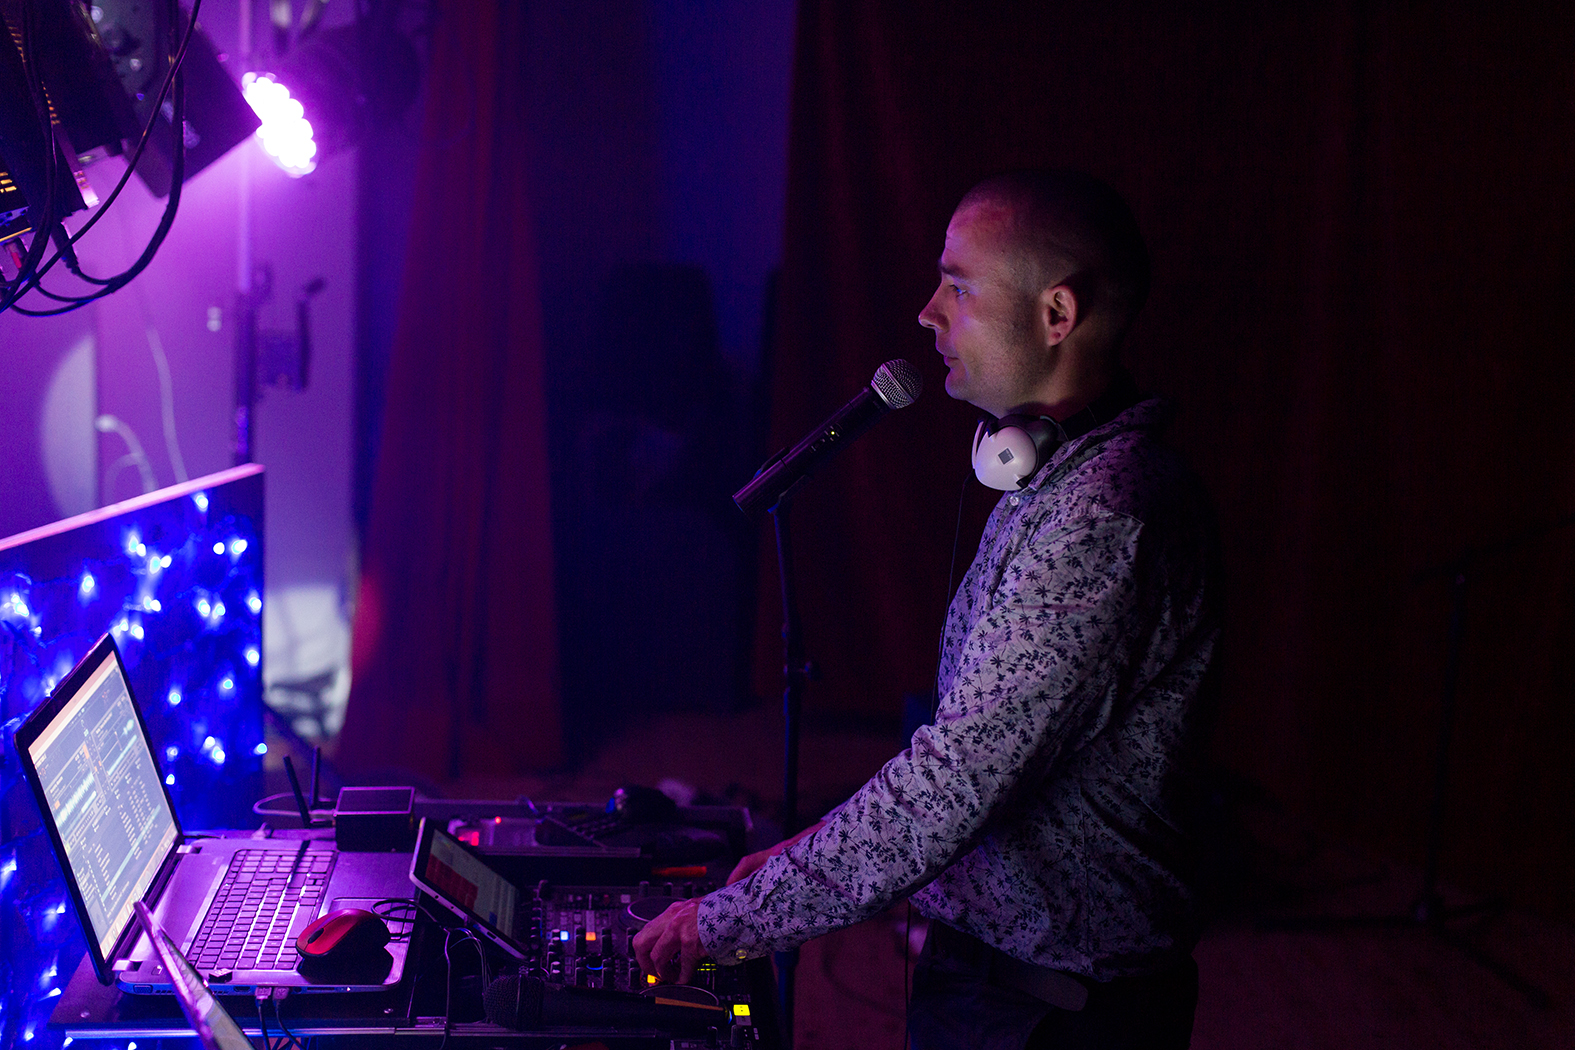 DJ FABE ANIMATION